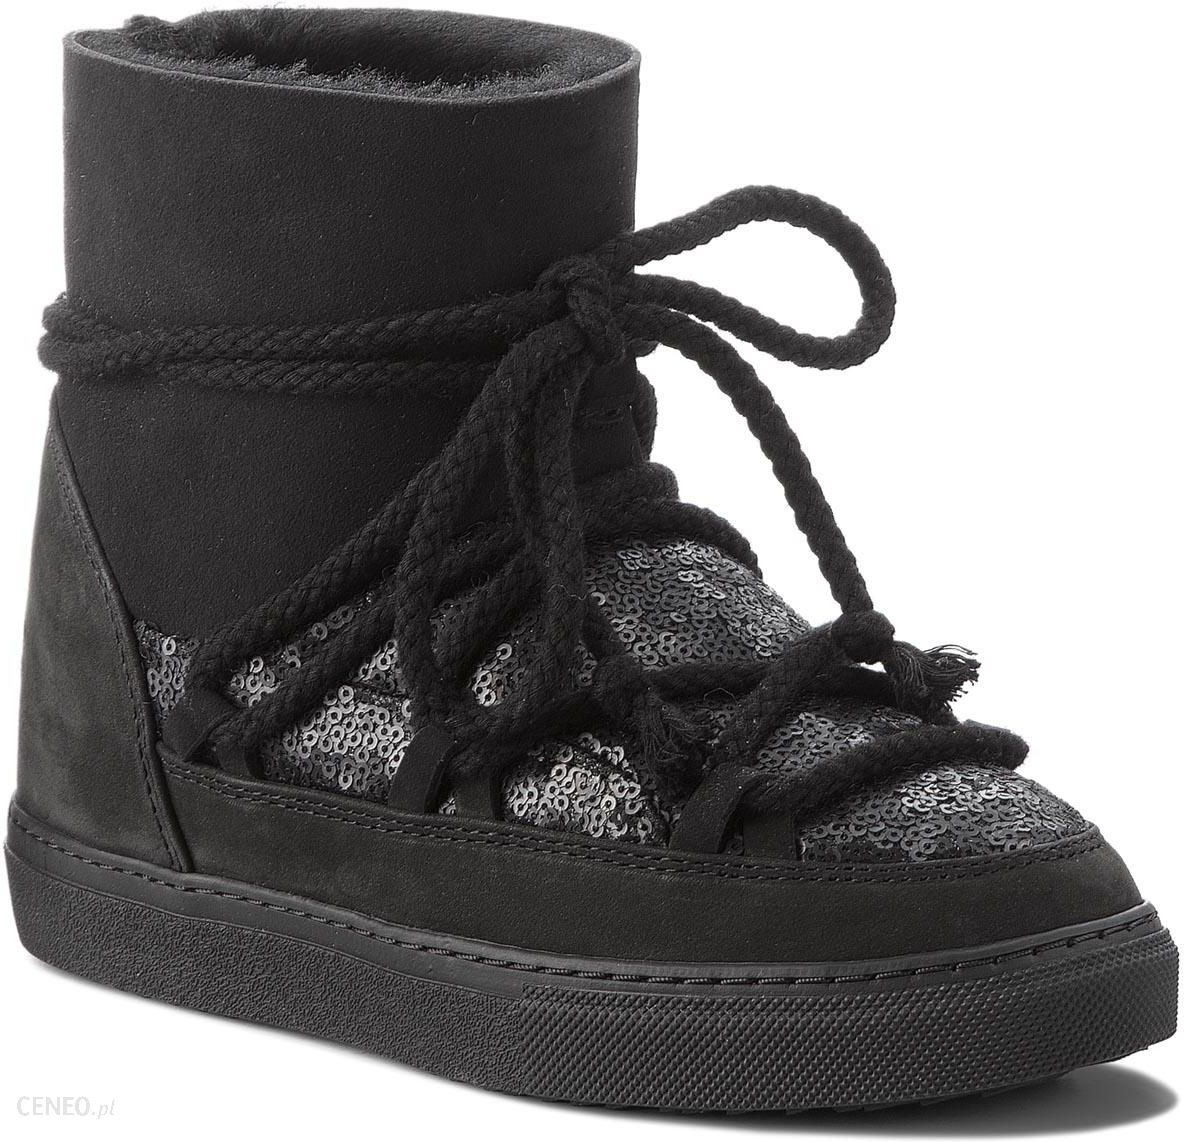 07f4cd7a1222 Buty INUIKII - Sneaker Sequin 70202-7 Black - Ceny i opinie - Ceneo.pl